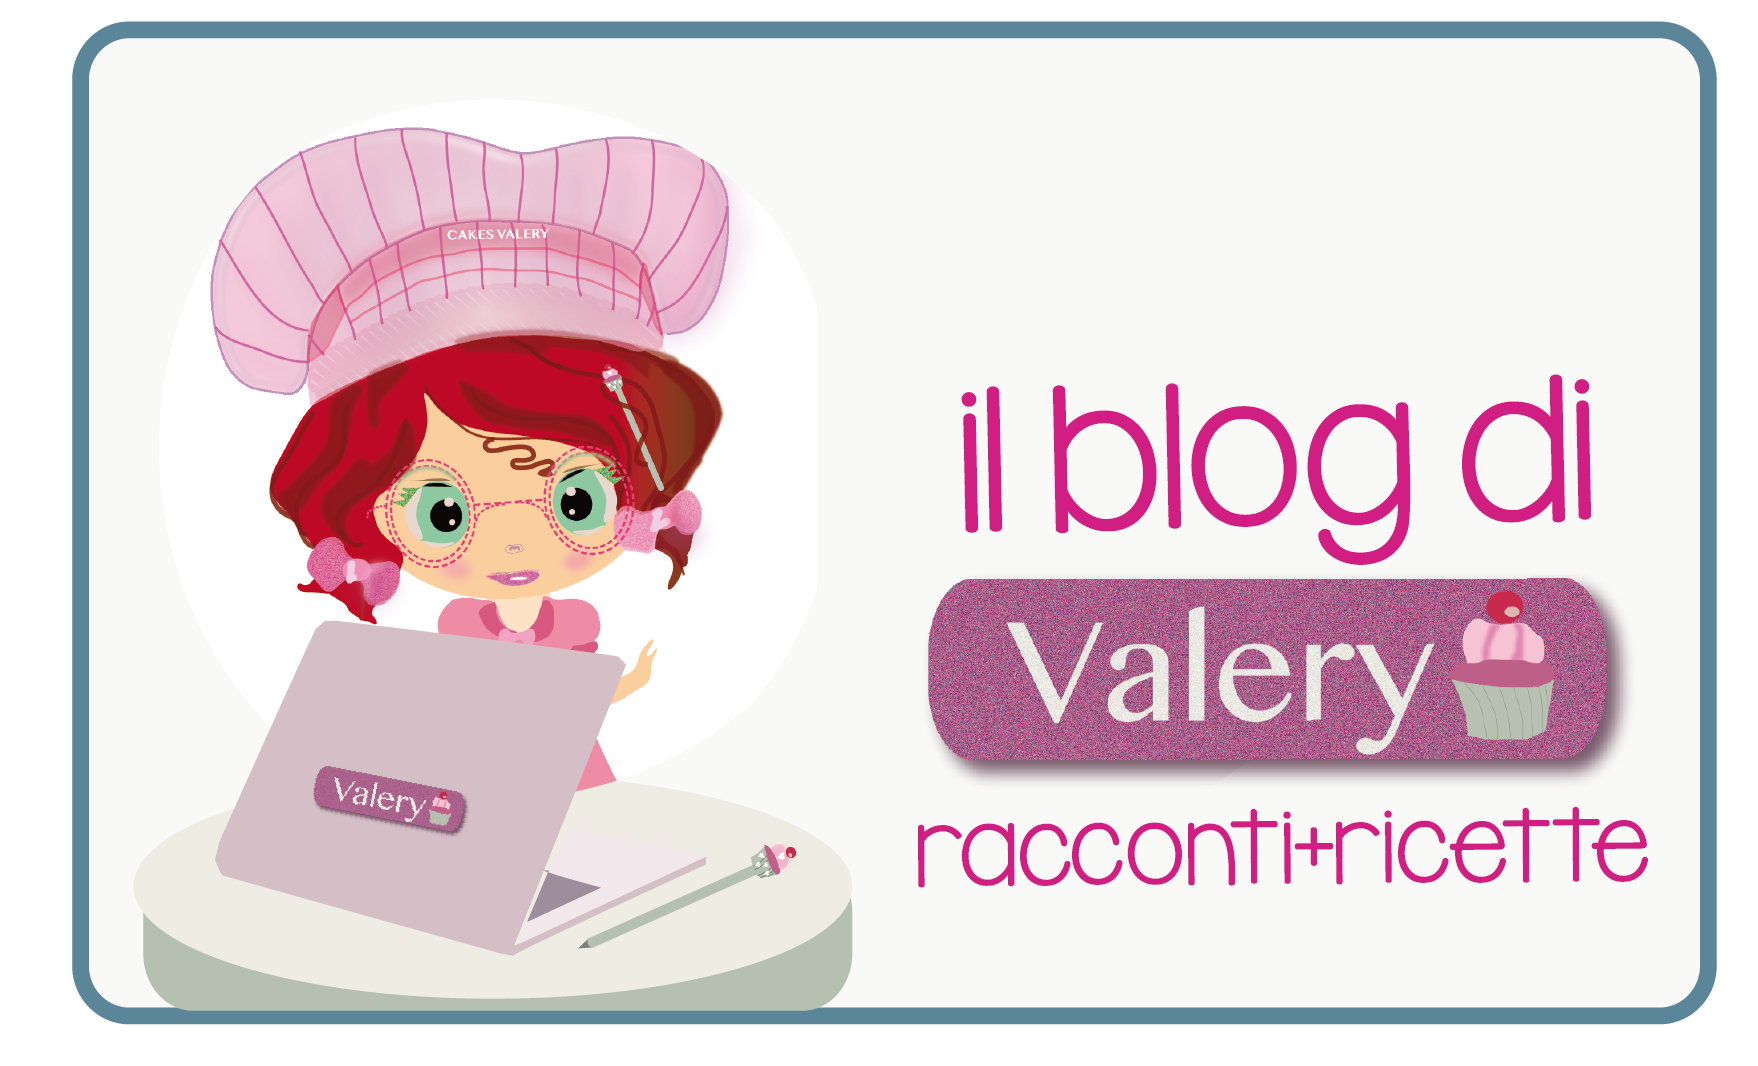 Blog di Valery